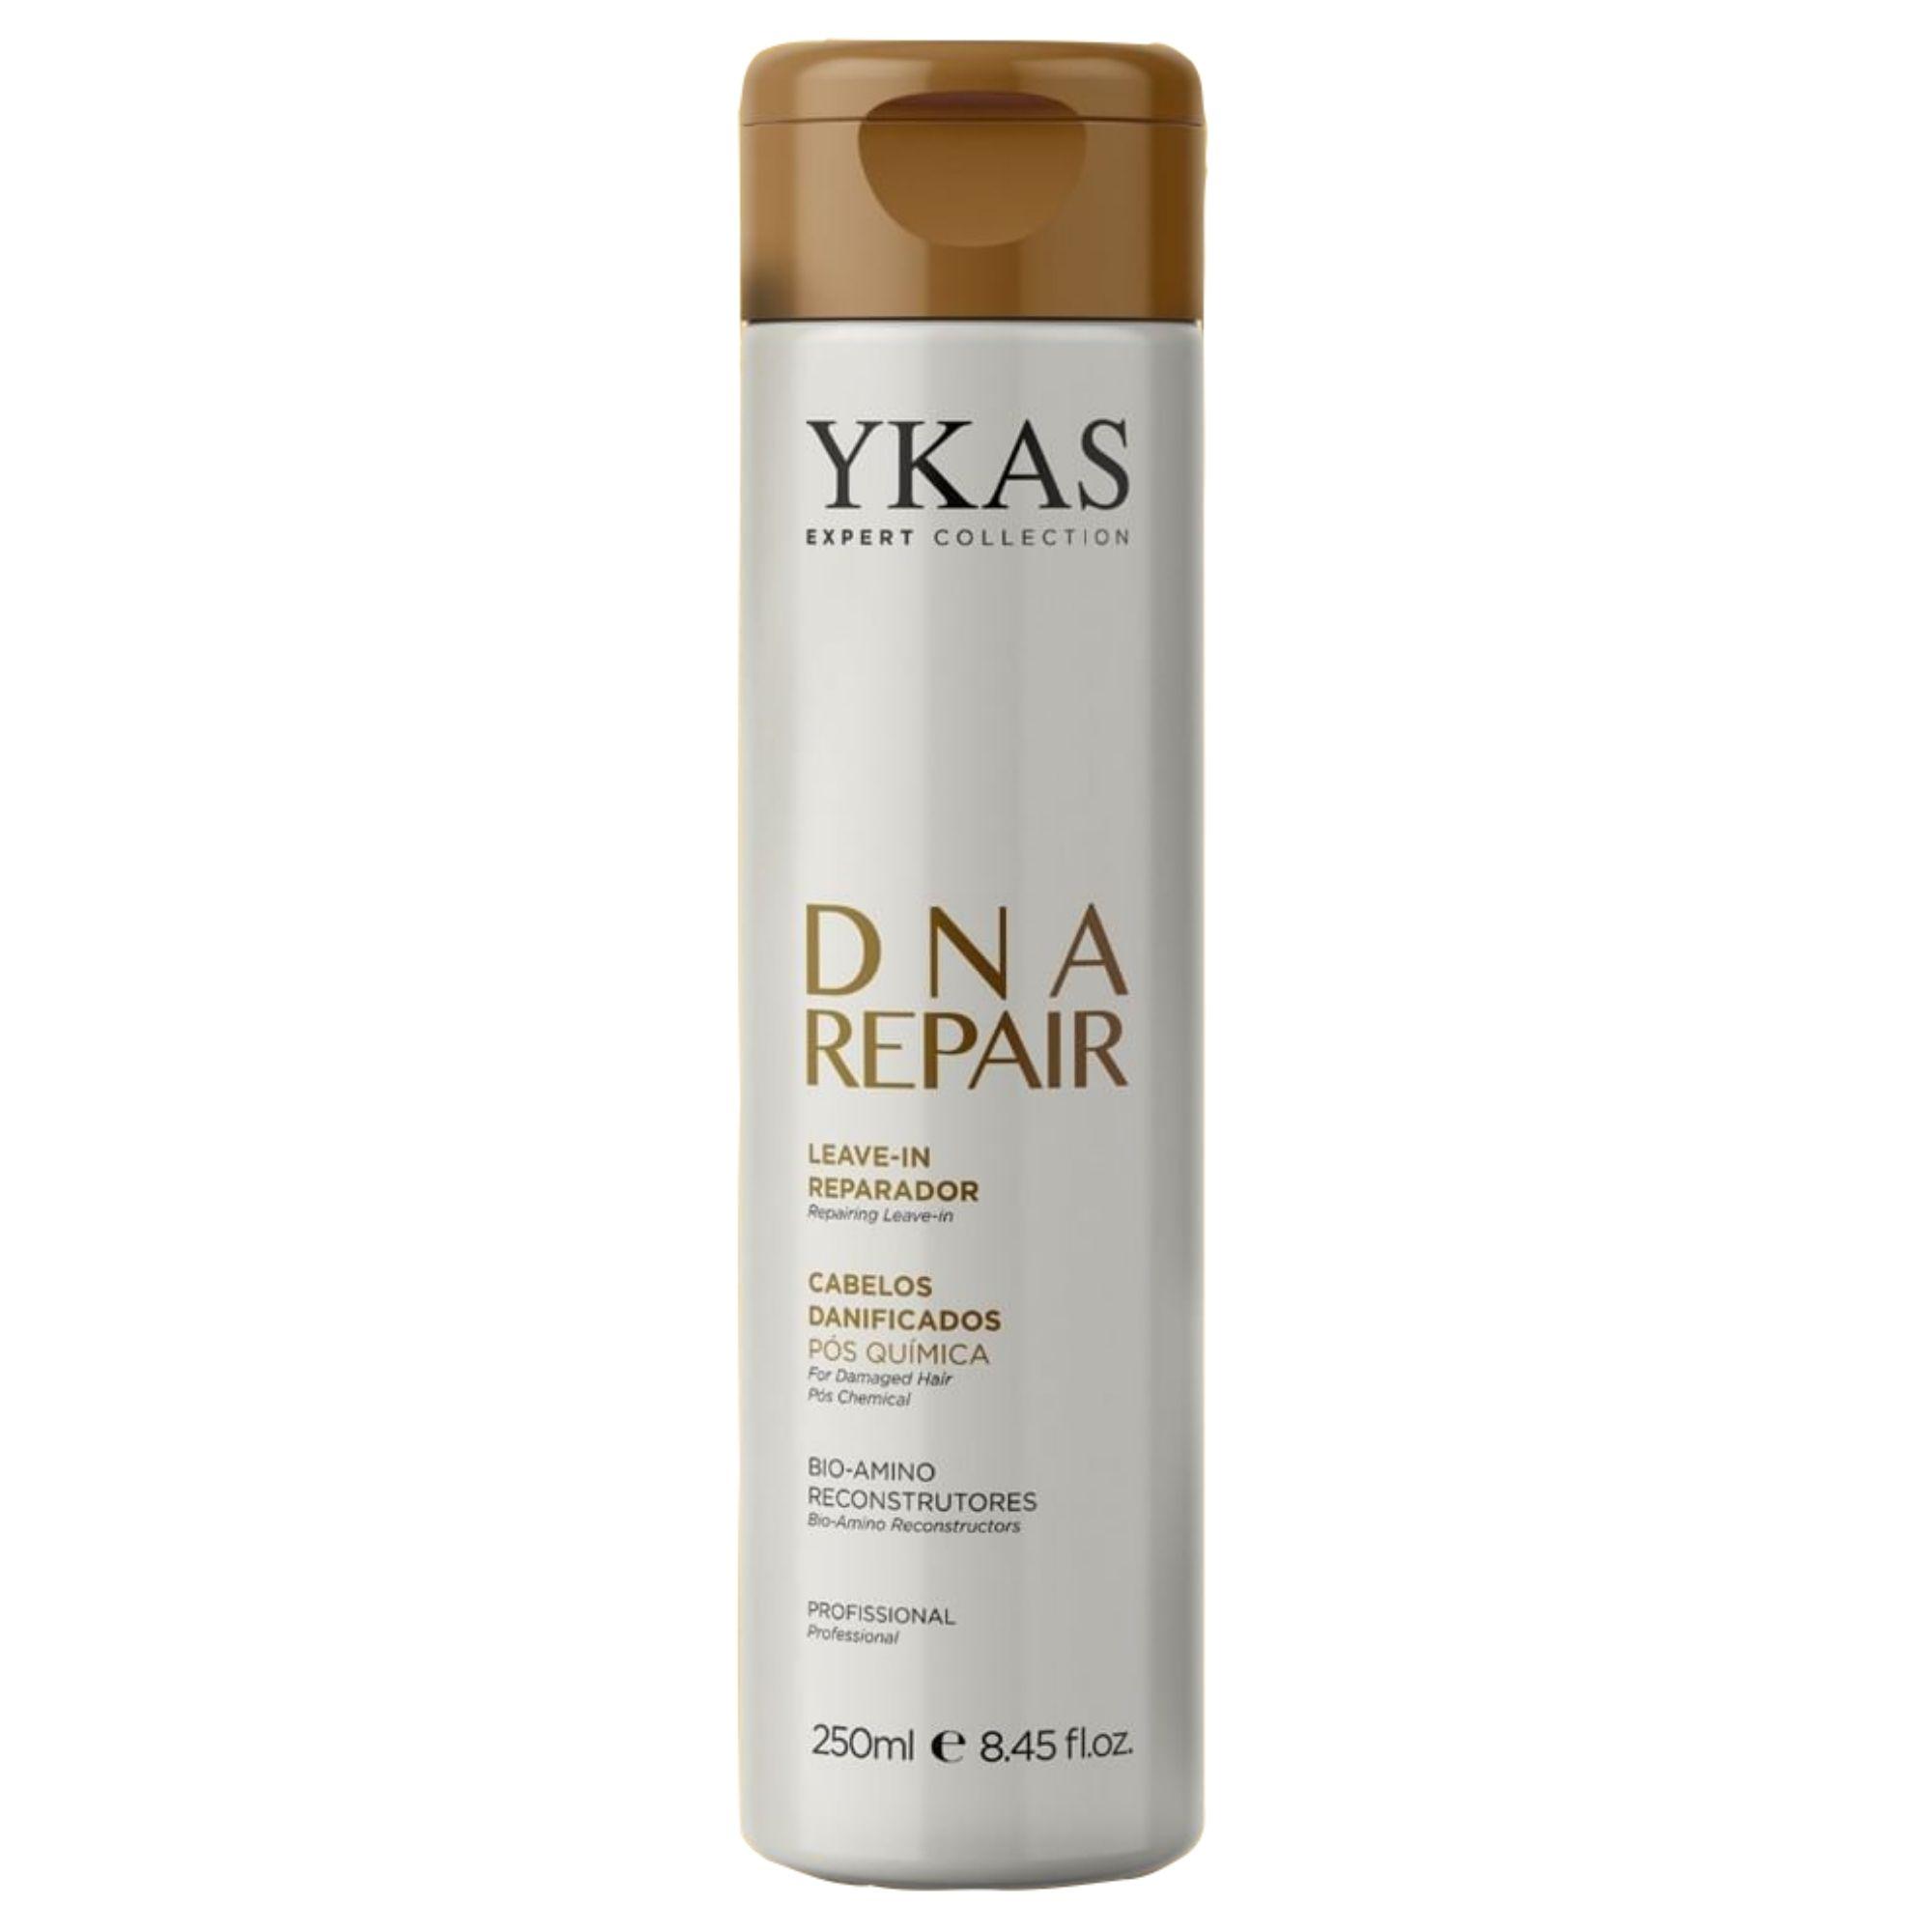 Leave-in DNA Repair Ykas 250ml